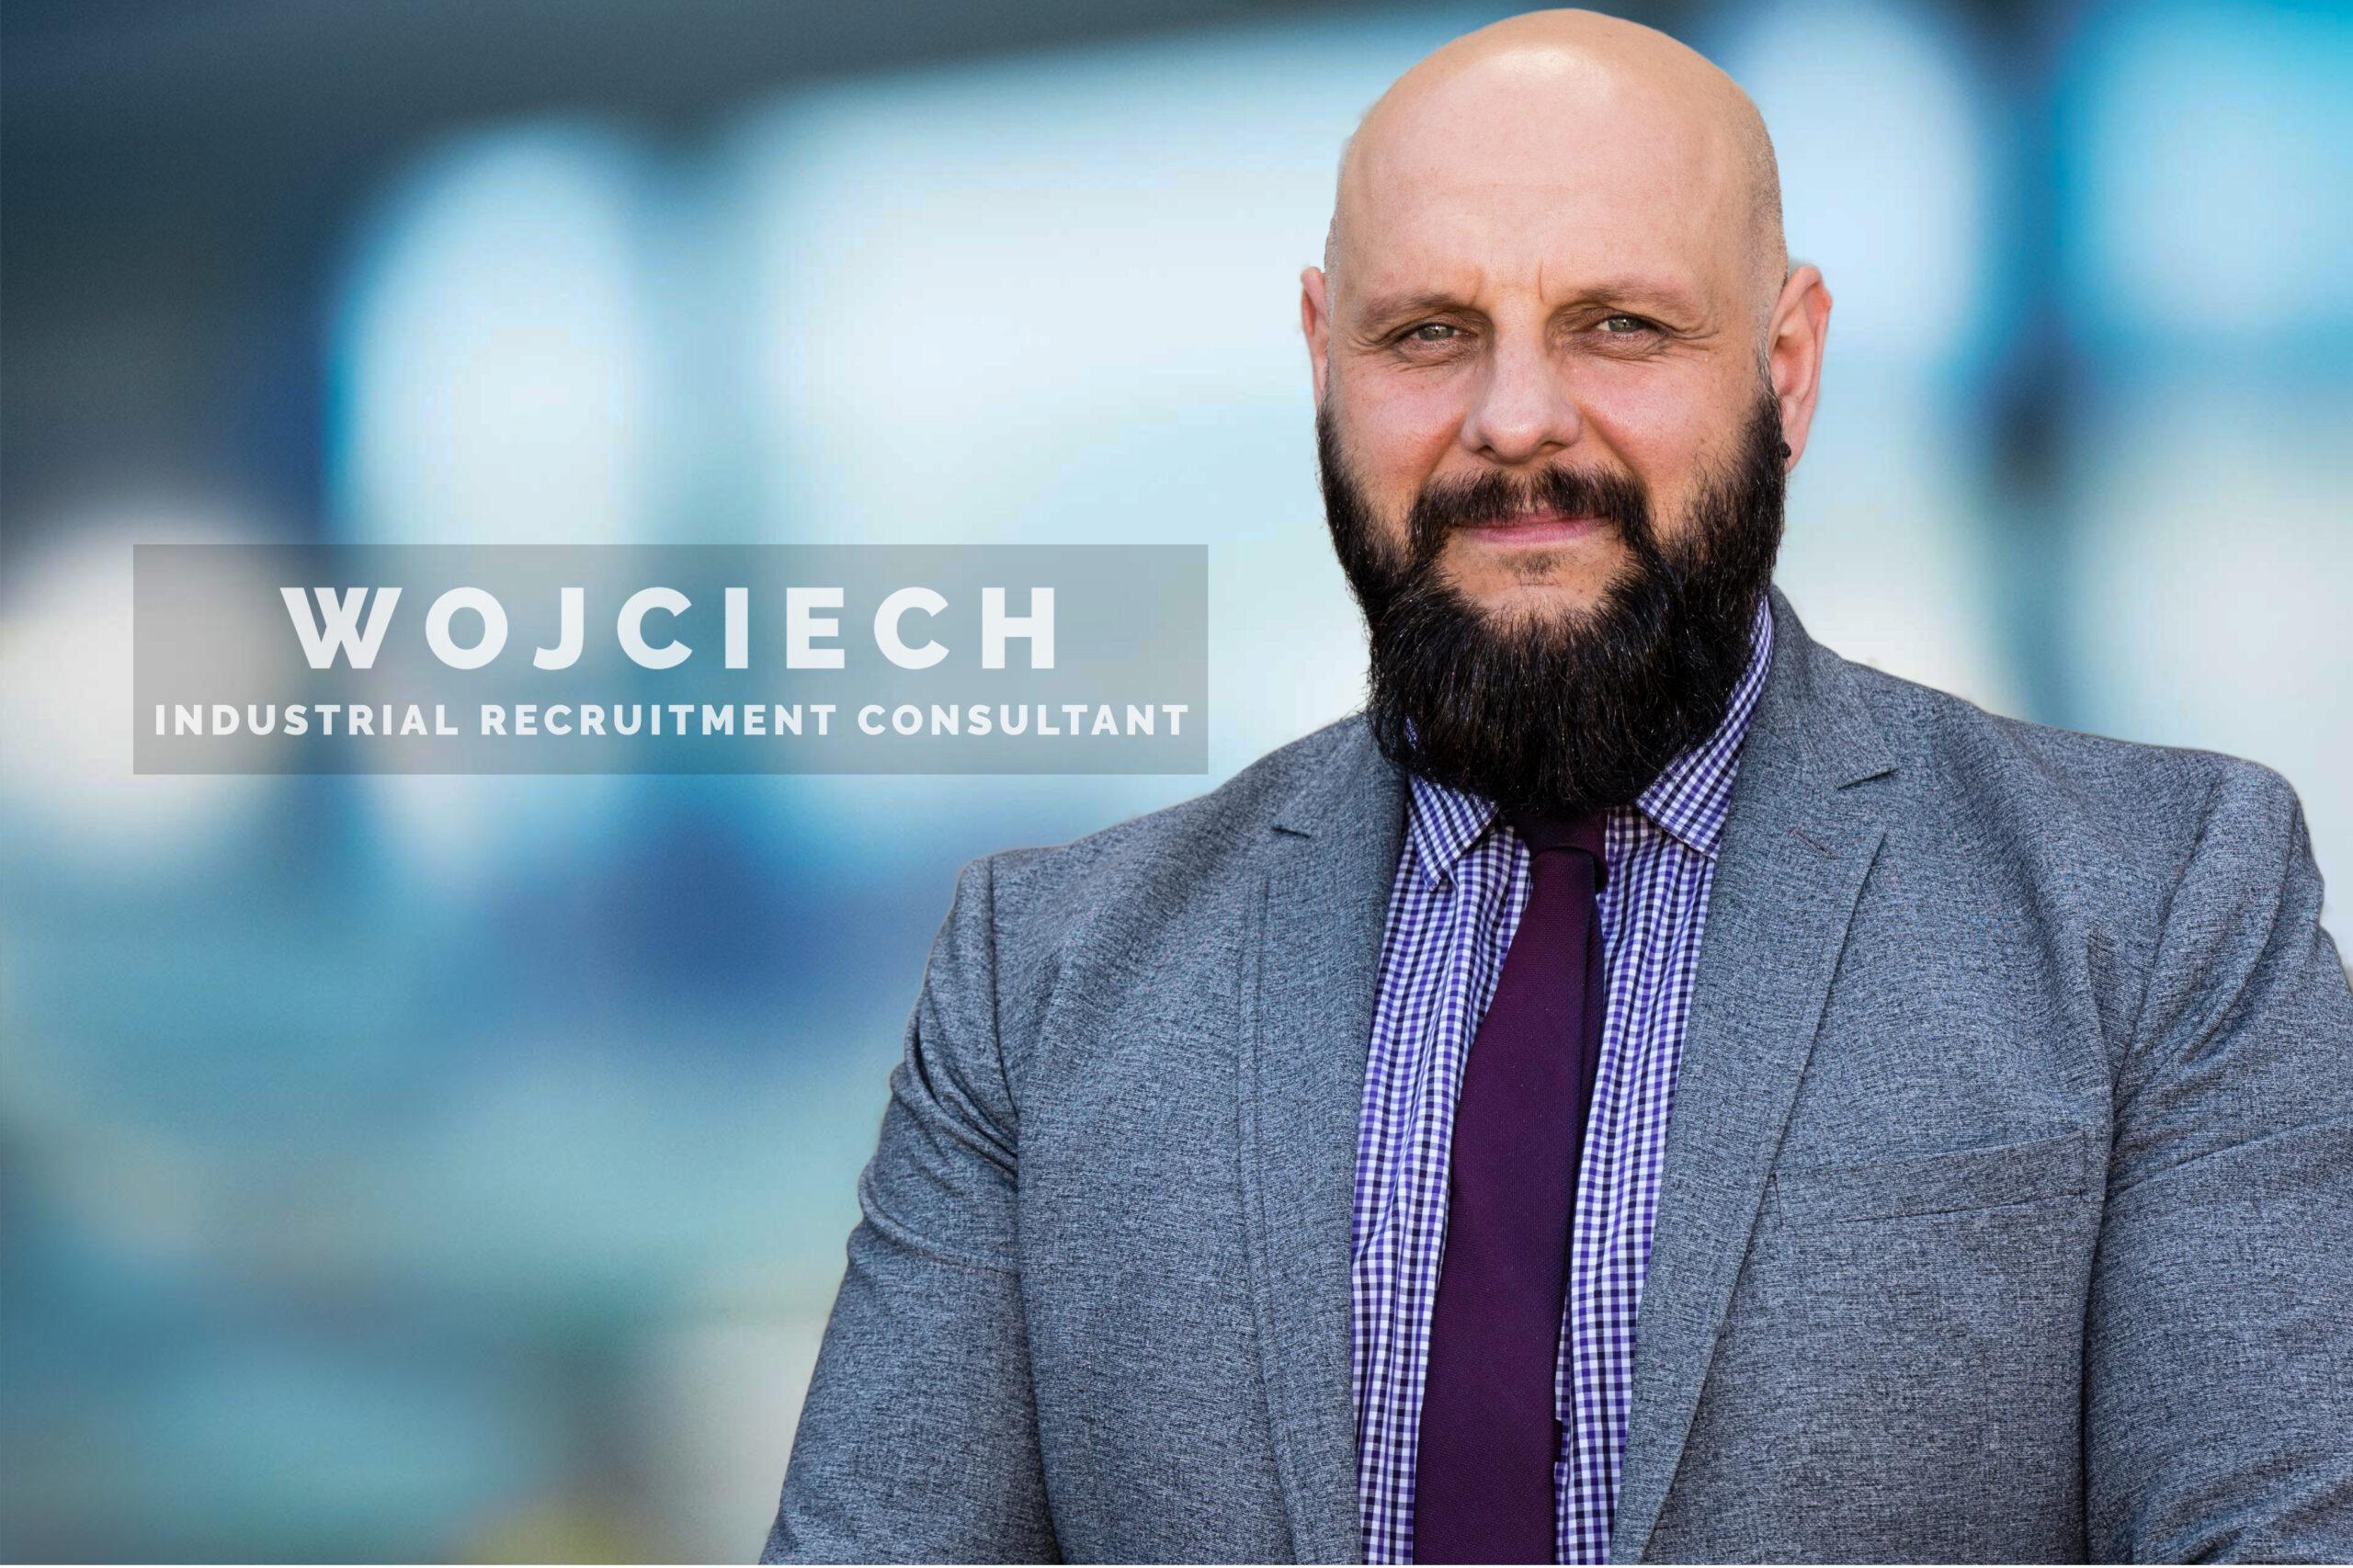 Wojciech - Industrial Recruitment Consultant